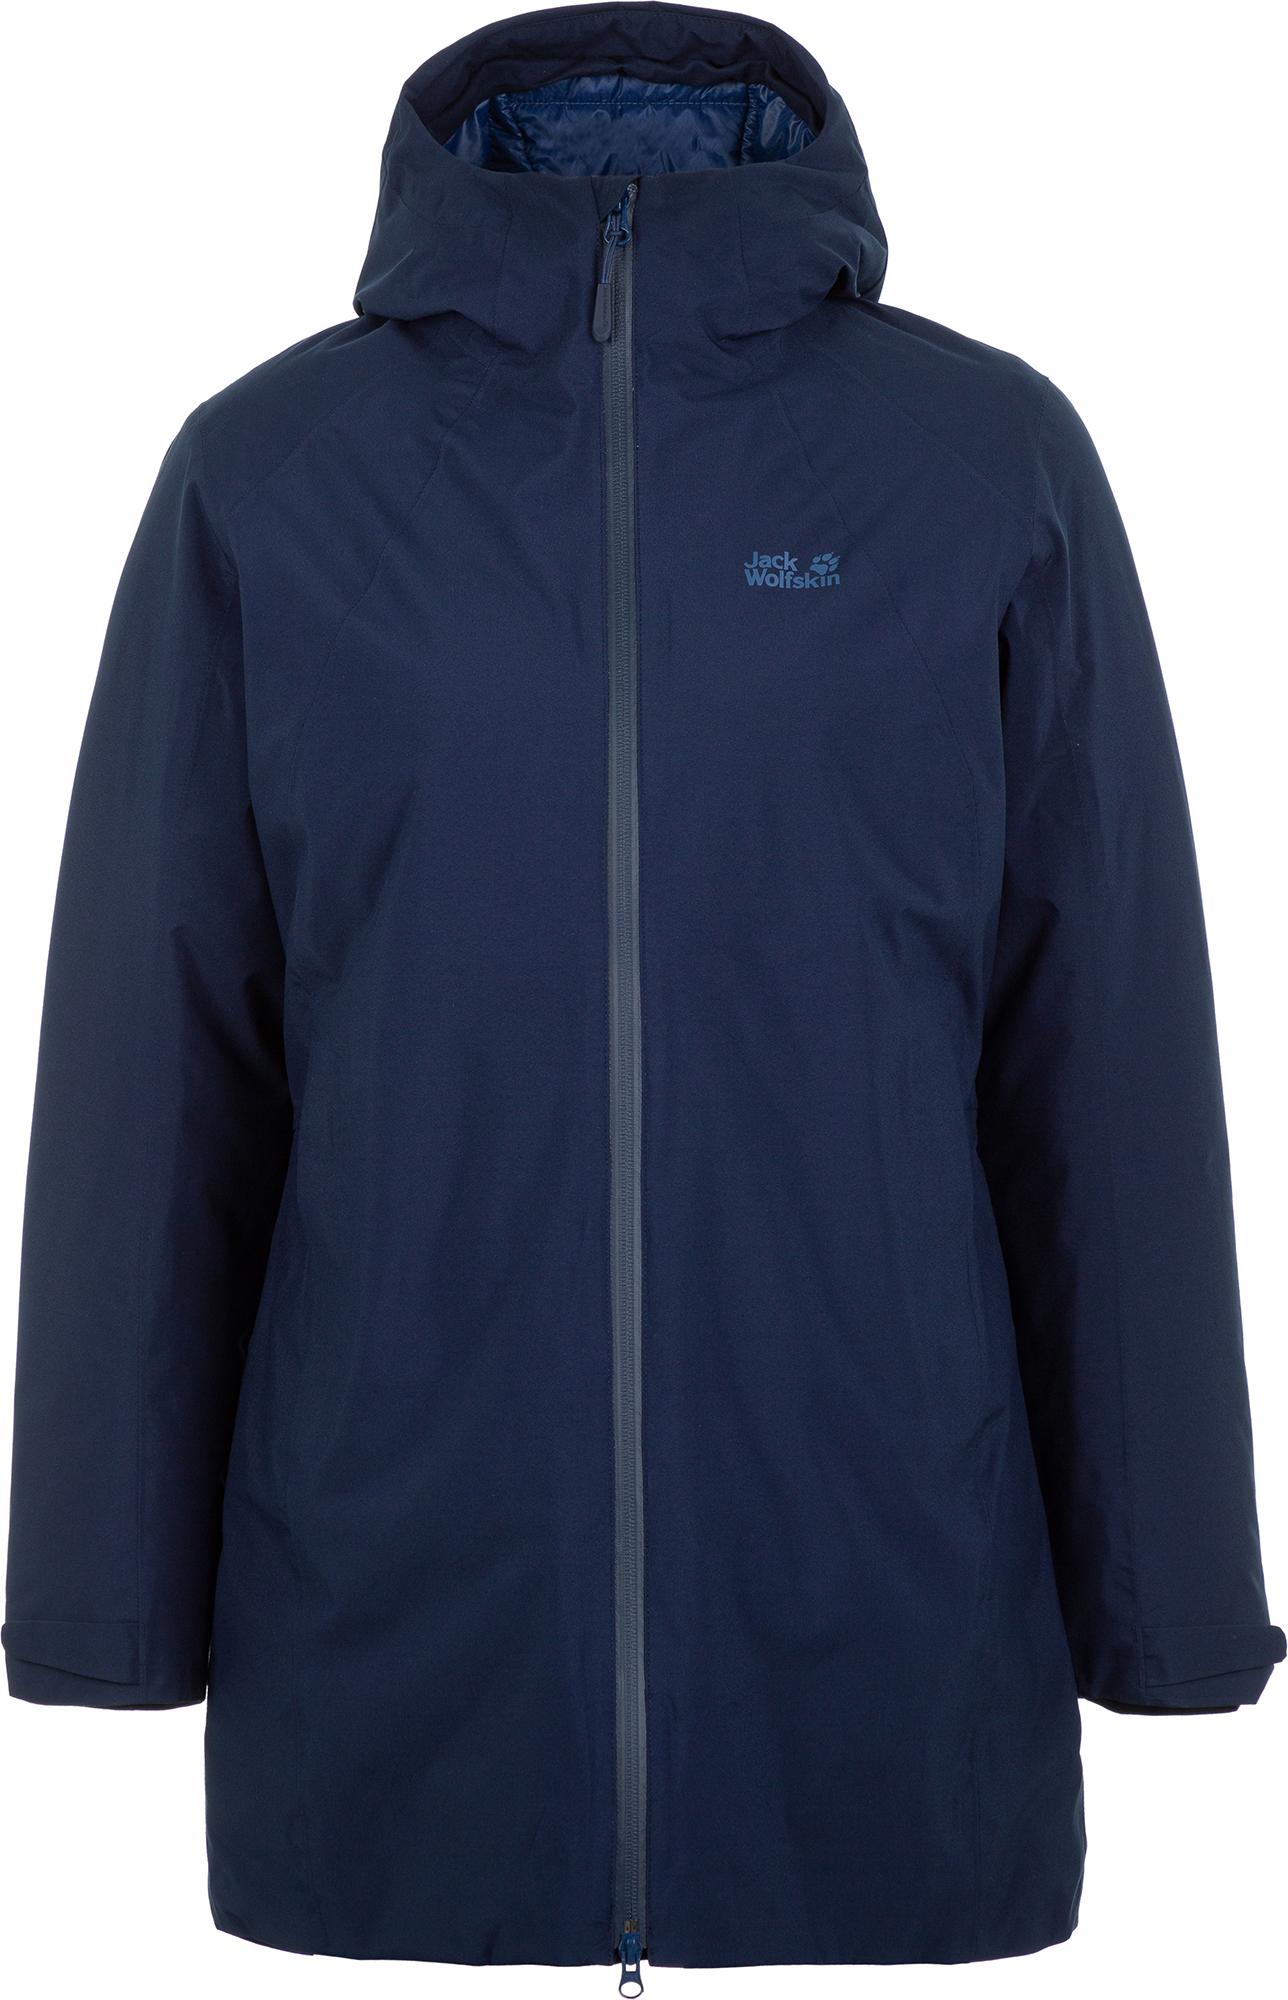 Jack Wolfskin Куртка утепленная женская Jack Wolfskin Astana, размер 50 цена и фото